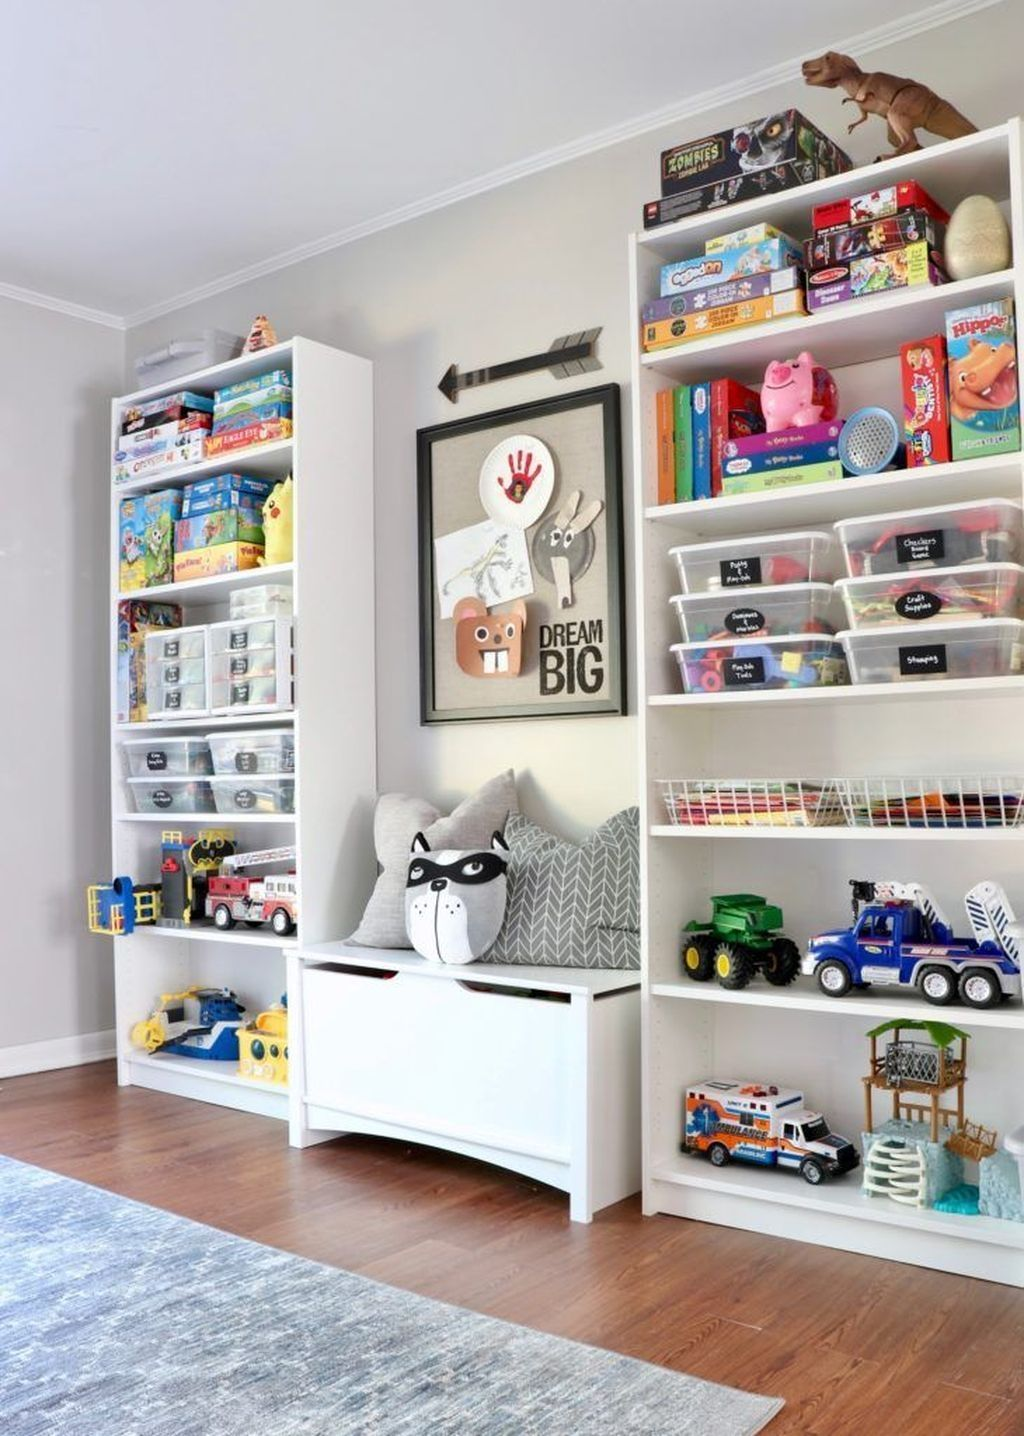 20 PRETTY PLAYROOM DESIGN IDEAS FOR CHILDRENS PLAYROOM